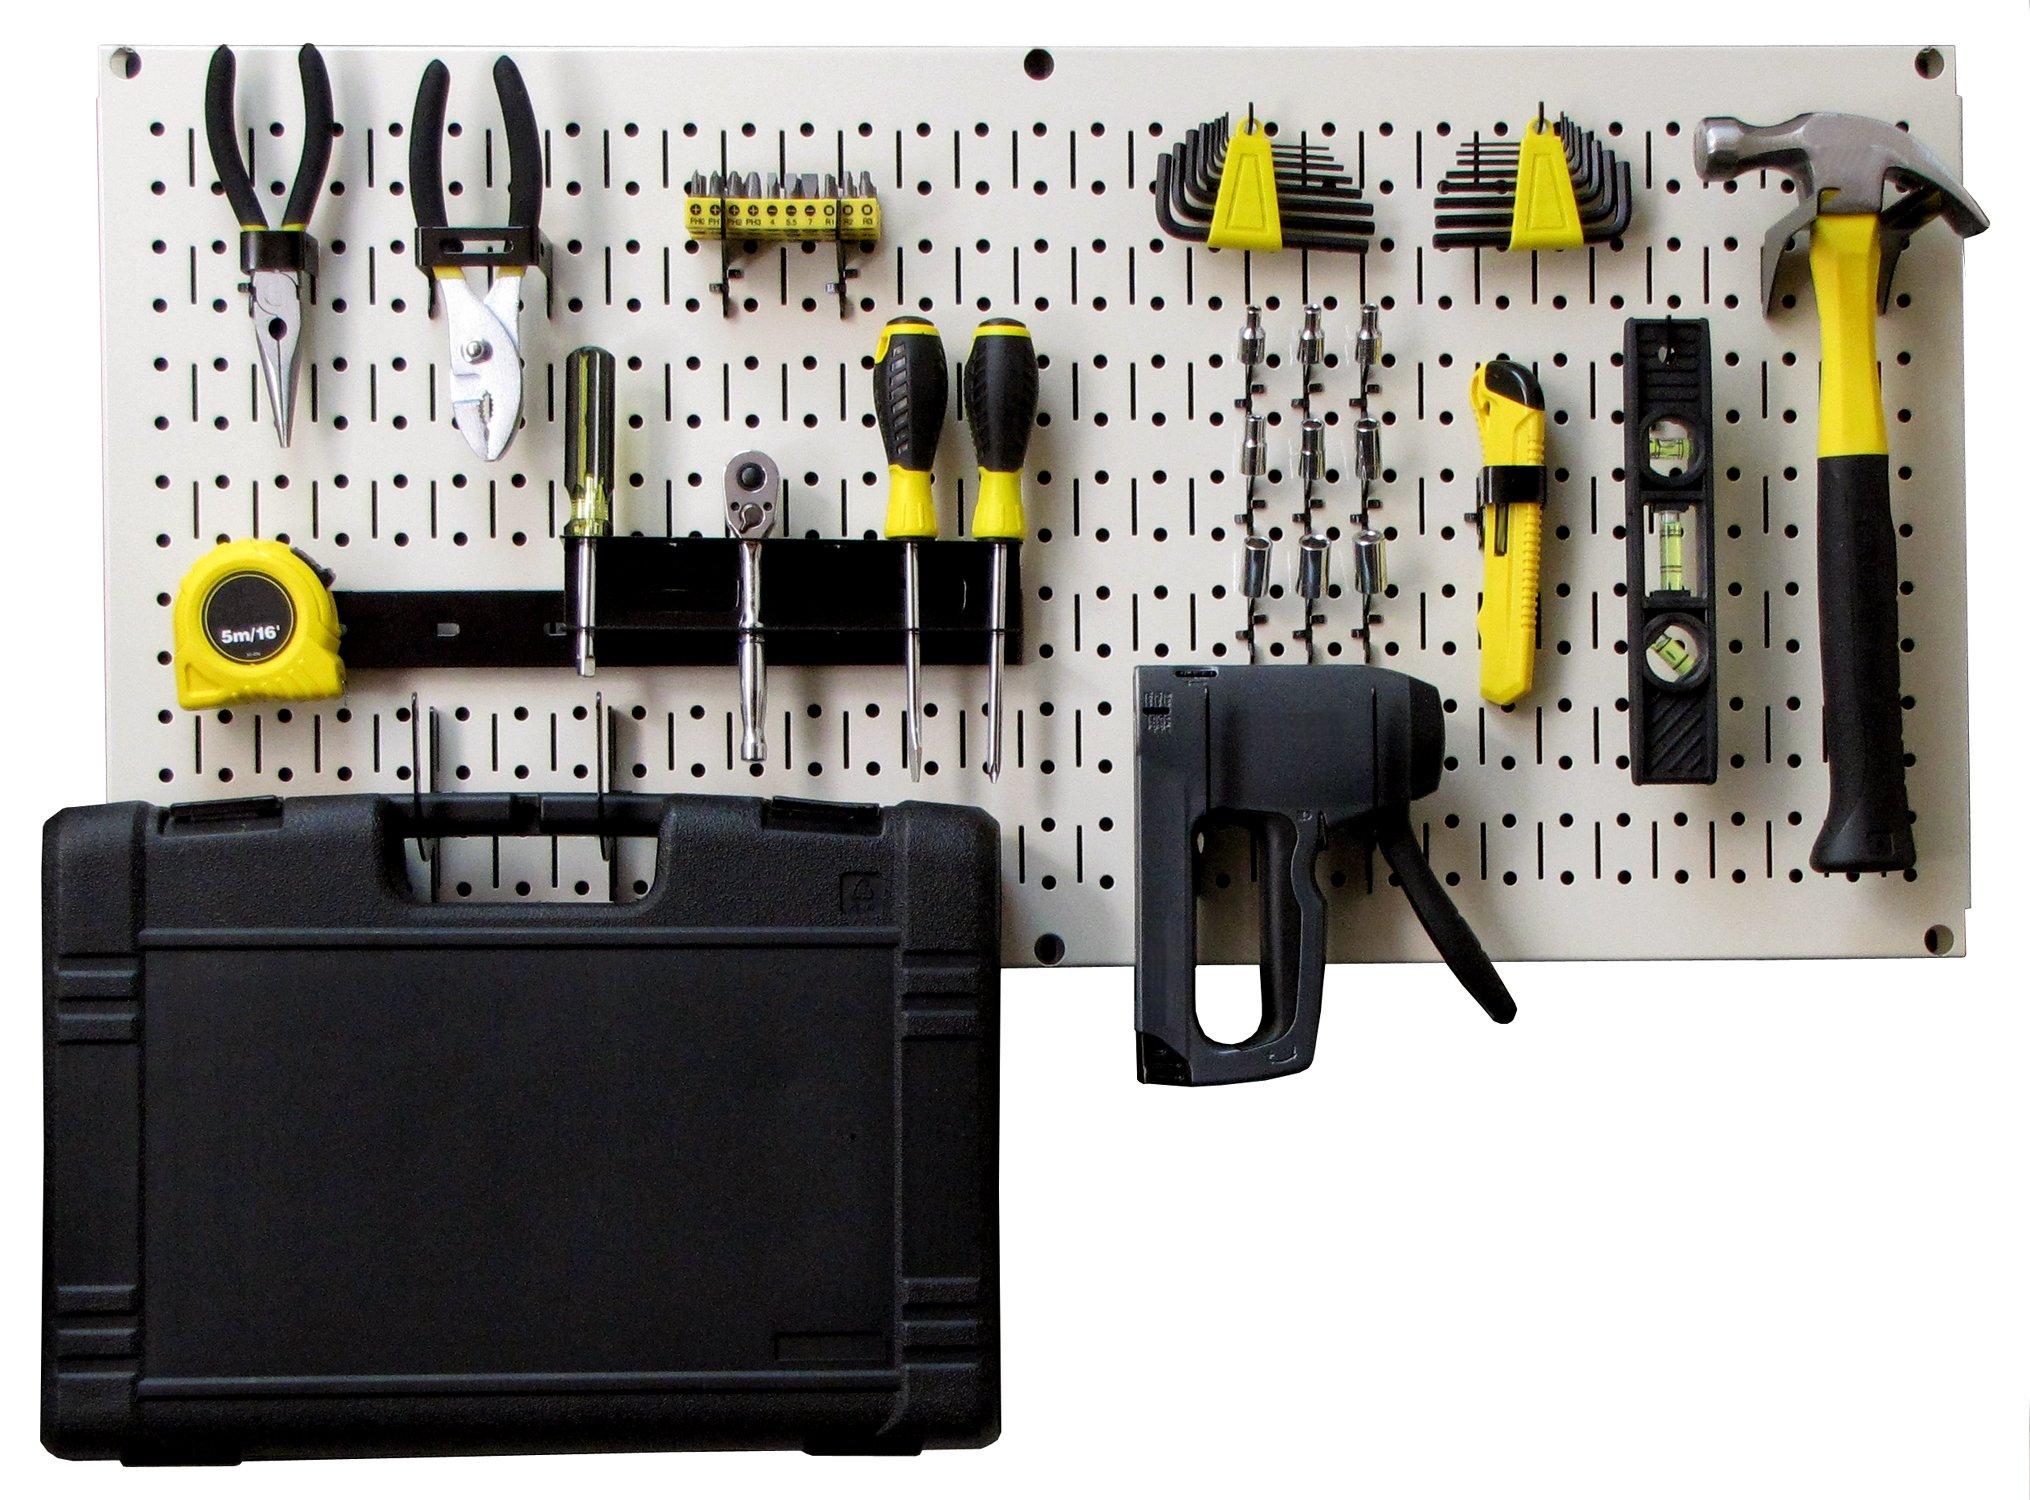 Wall Control Modular Pegboard Tool Organizer System - Wall-Mounted Metal Peg Board Tool Storage Unit for Pegboard Tiling (Beige Pegboard)